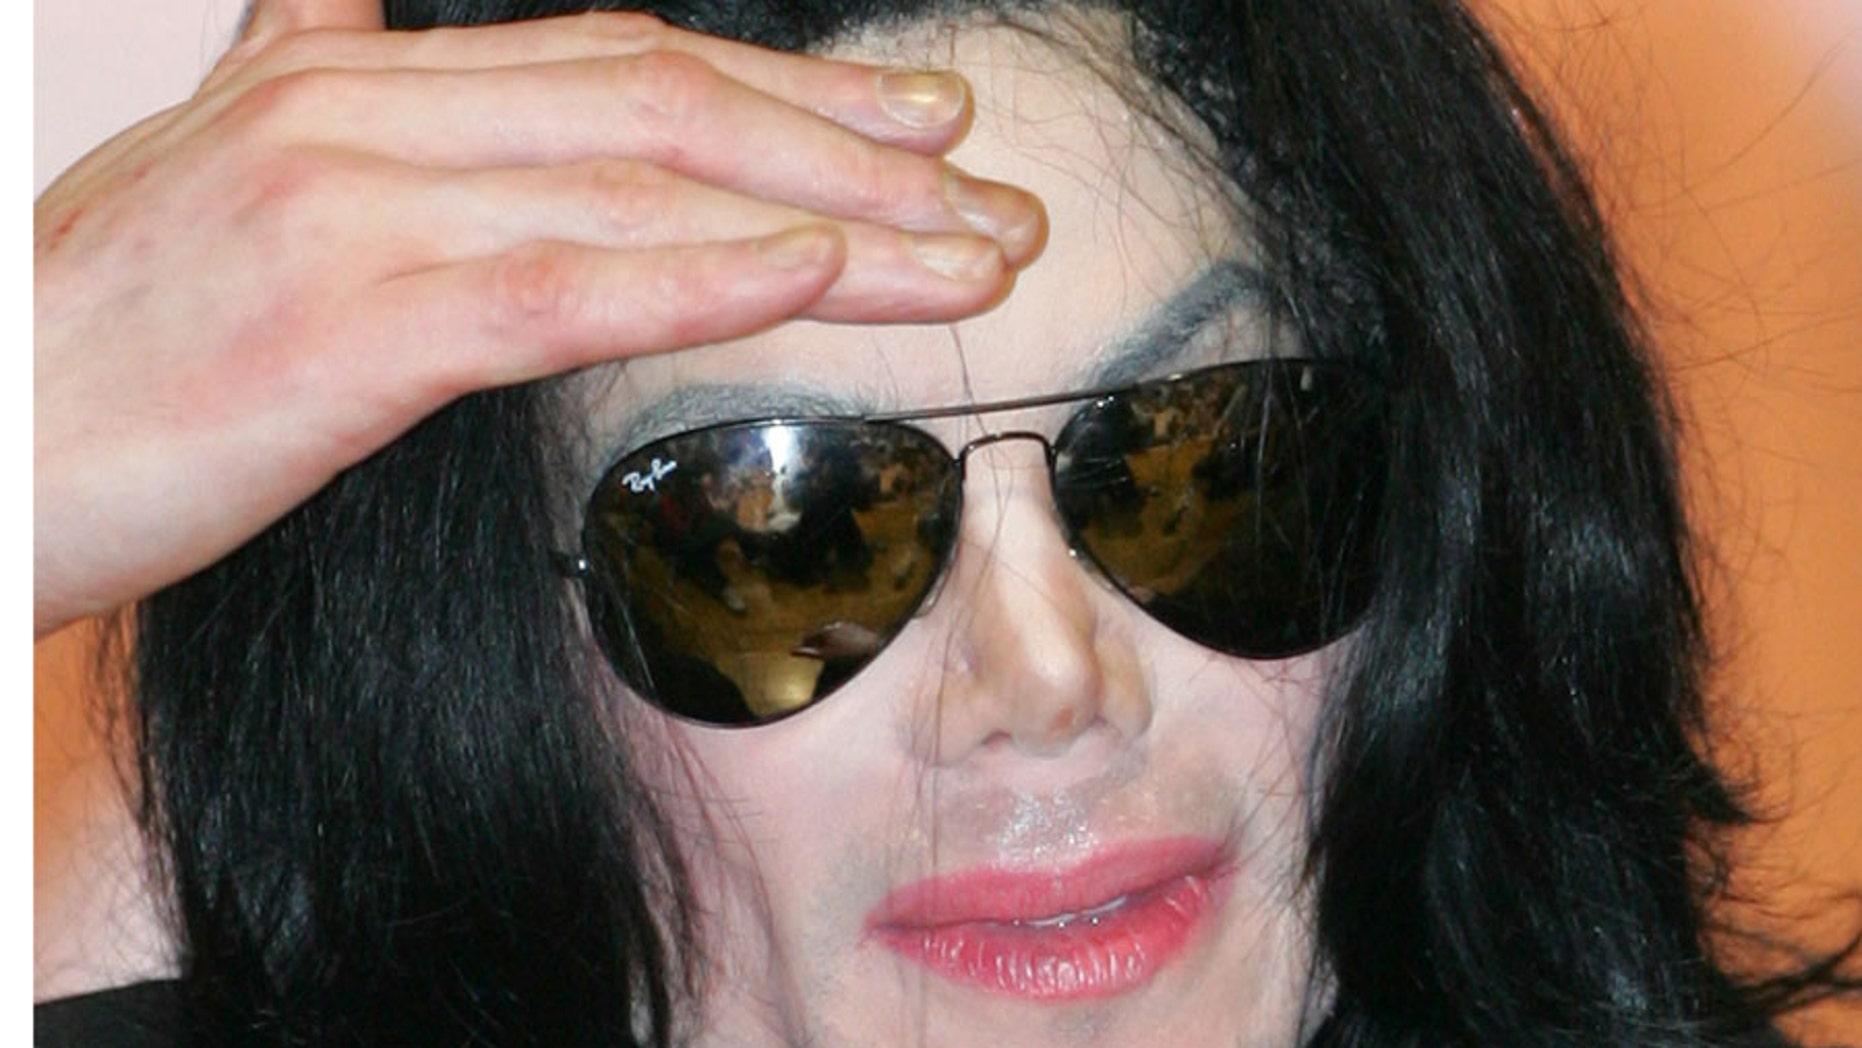 Pop star Michael Jacksone in Tokyo May 28, 2006. REUTERS/Issei Kato